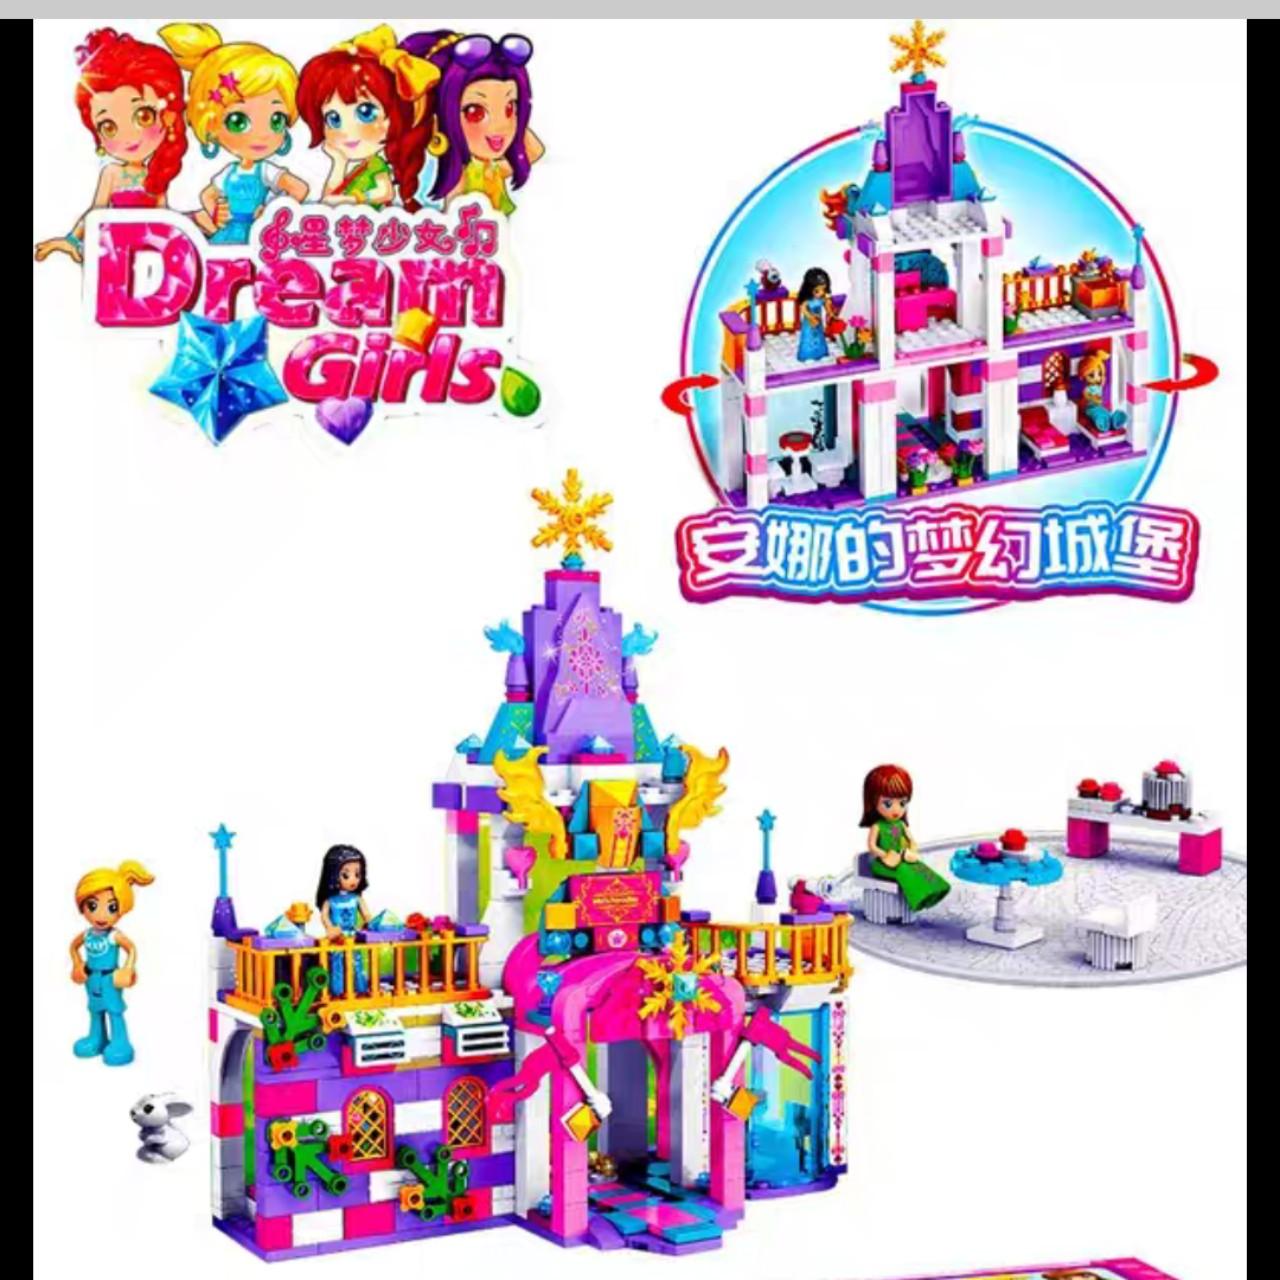 Lego Friend Lâu Đài Dream Girl 443 chi tiết - 52008